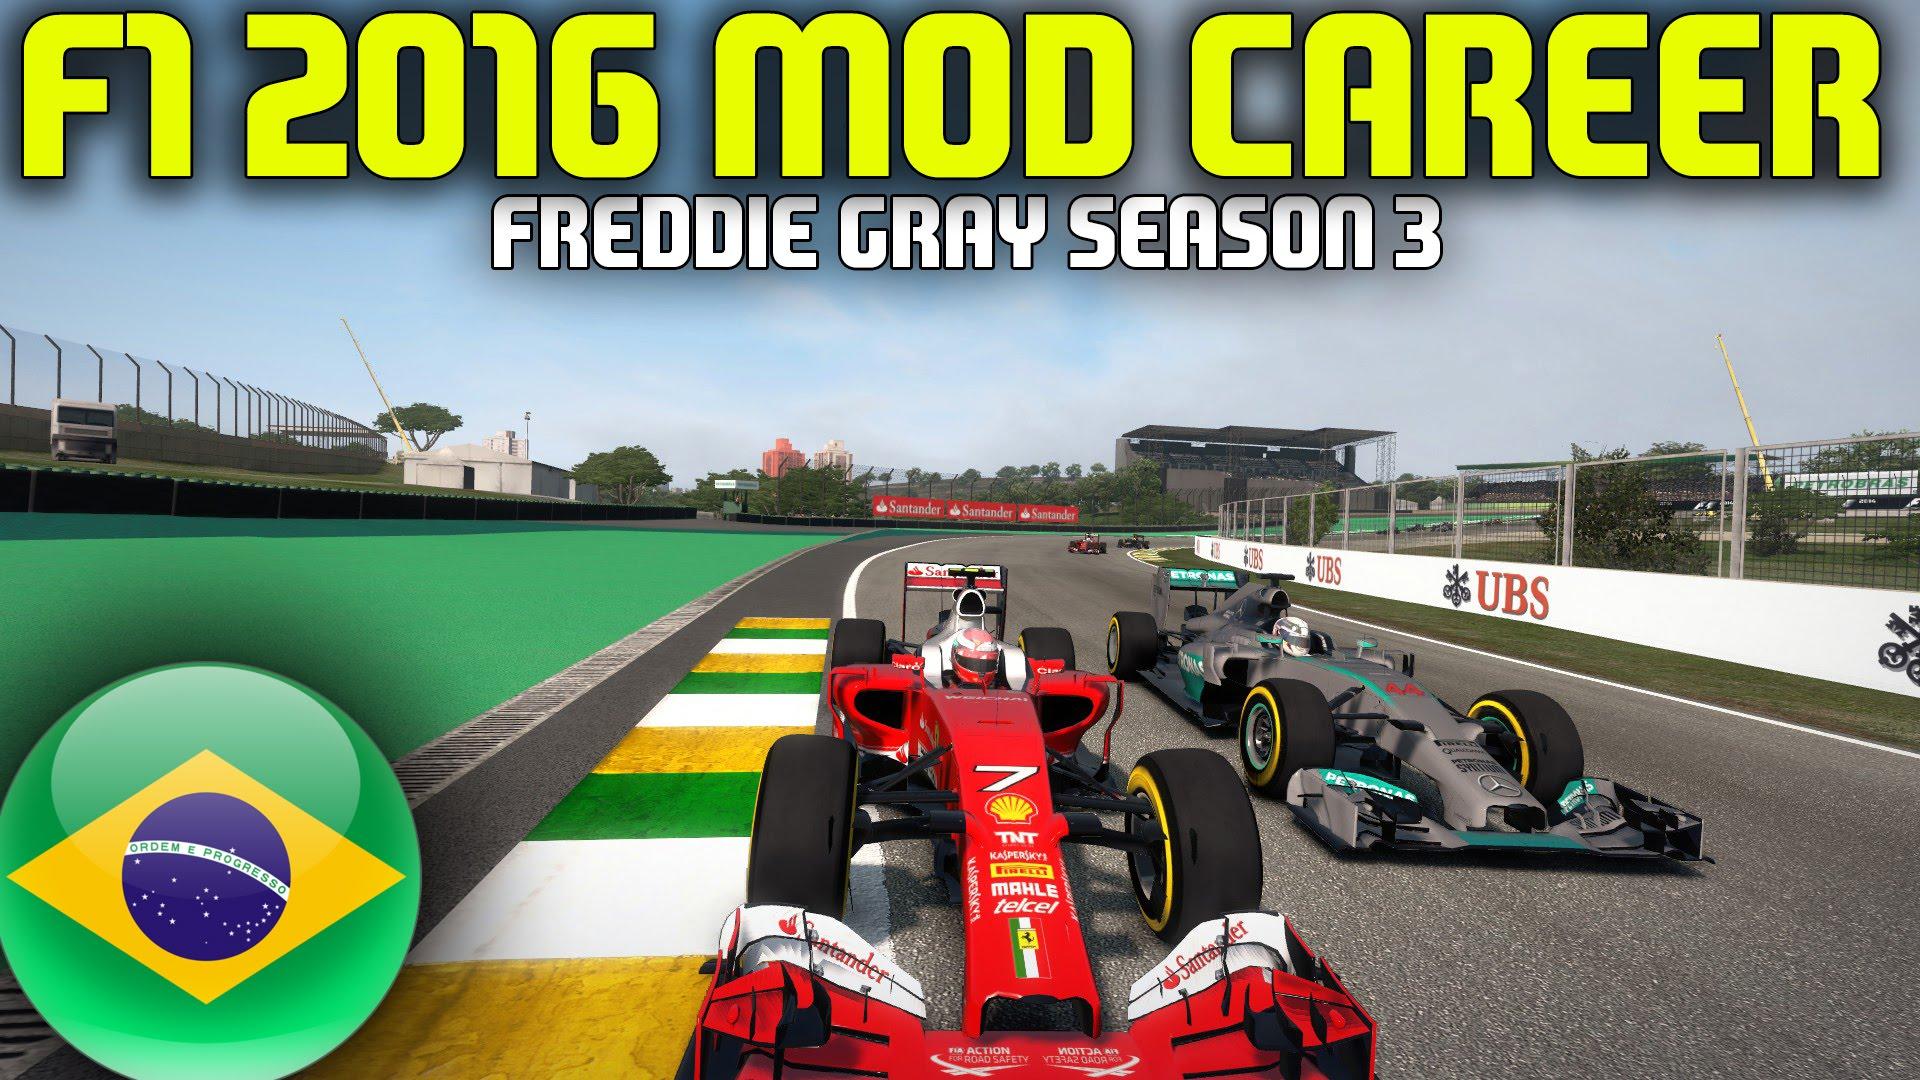 F1 Brazilian Grand Prix 2016